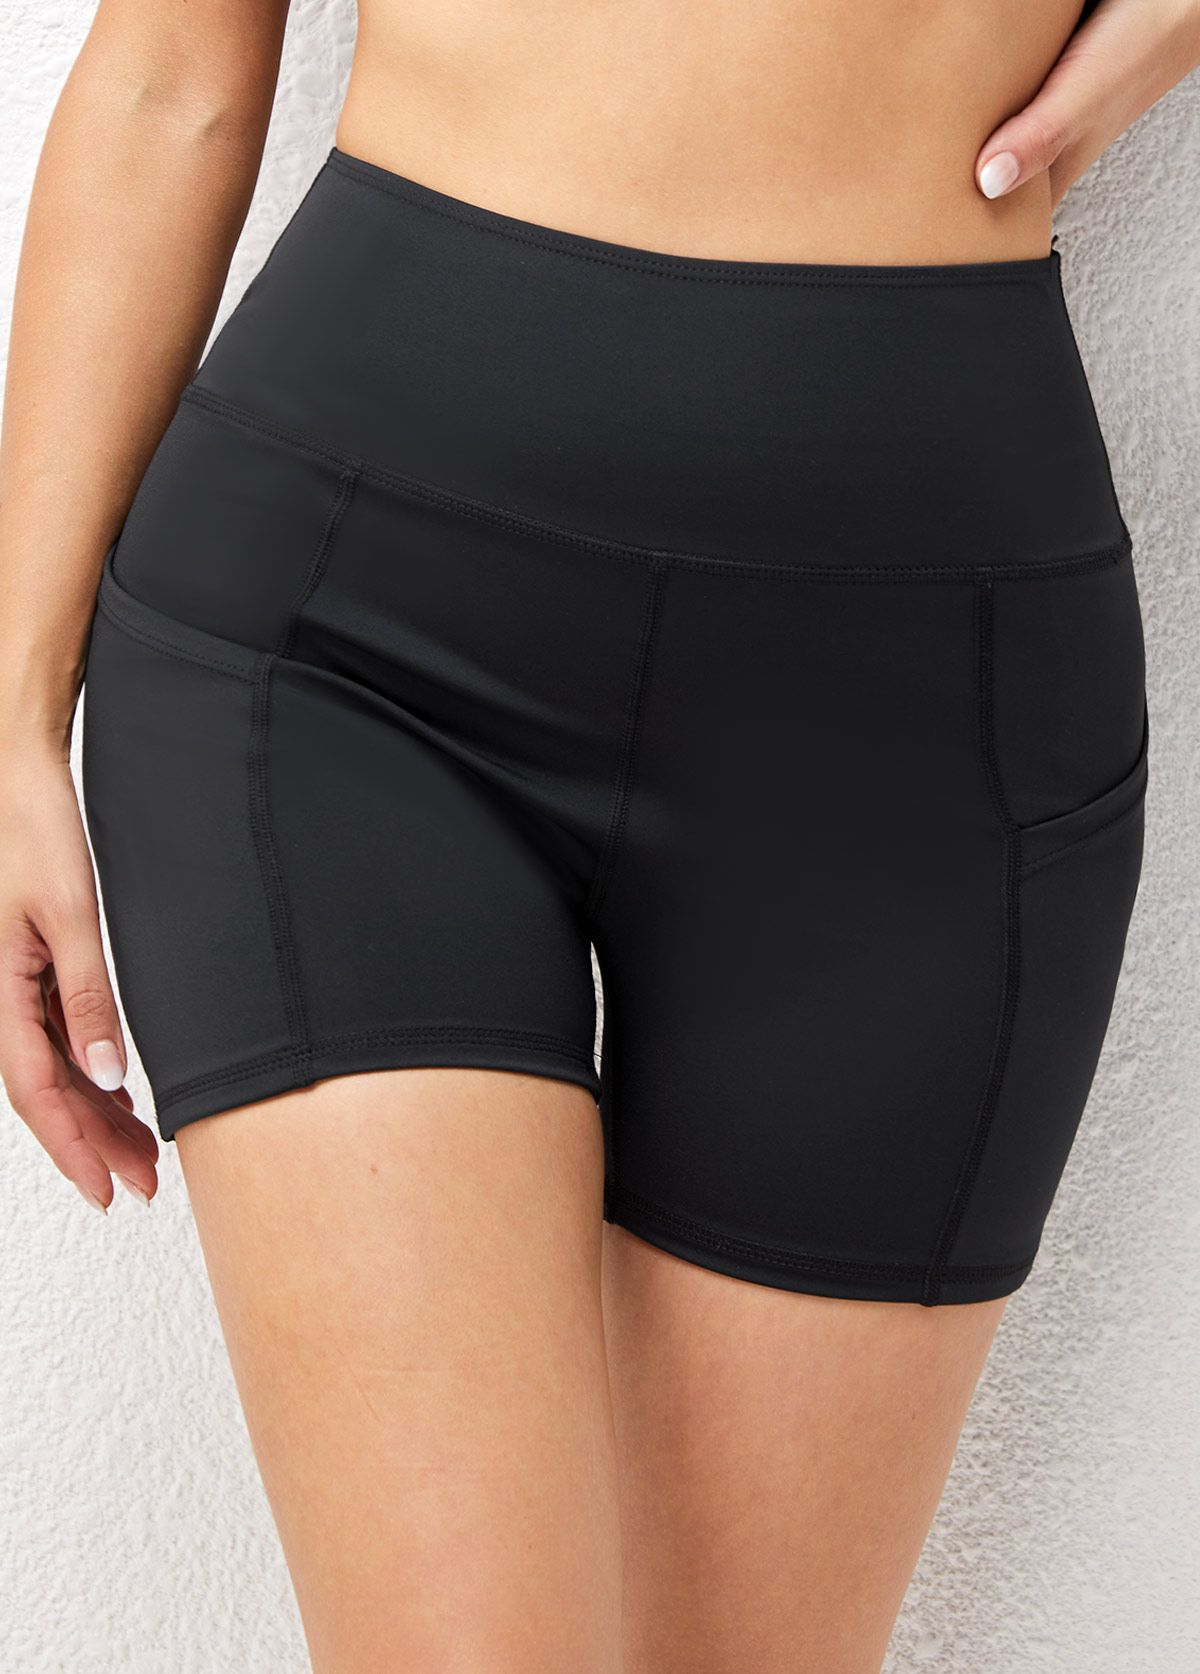 Solid High Waisted Pocket Skinny Sports Bottom